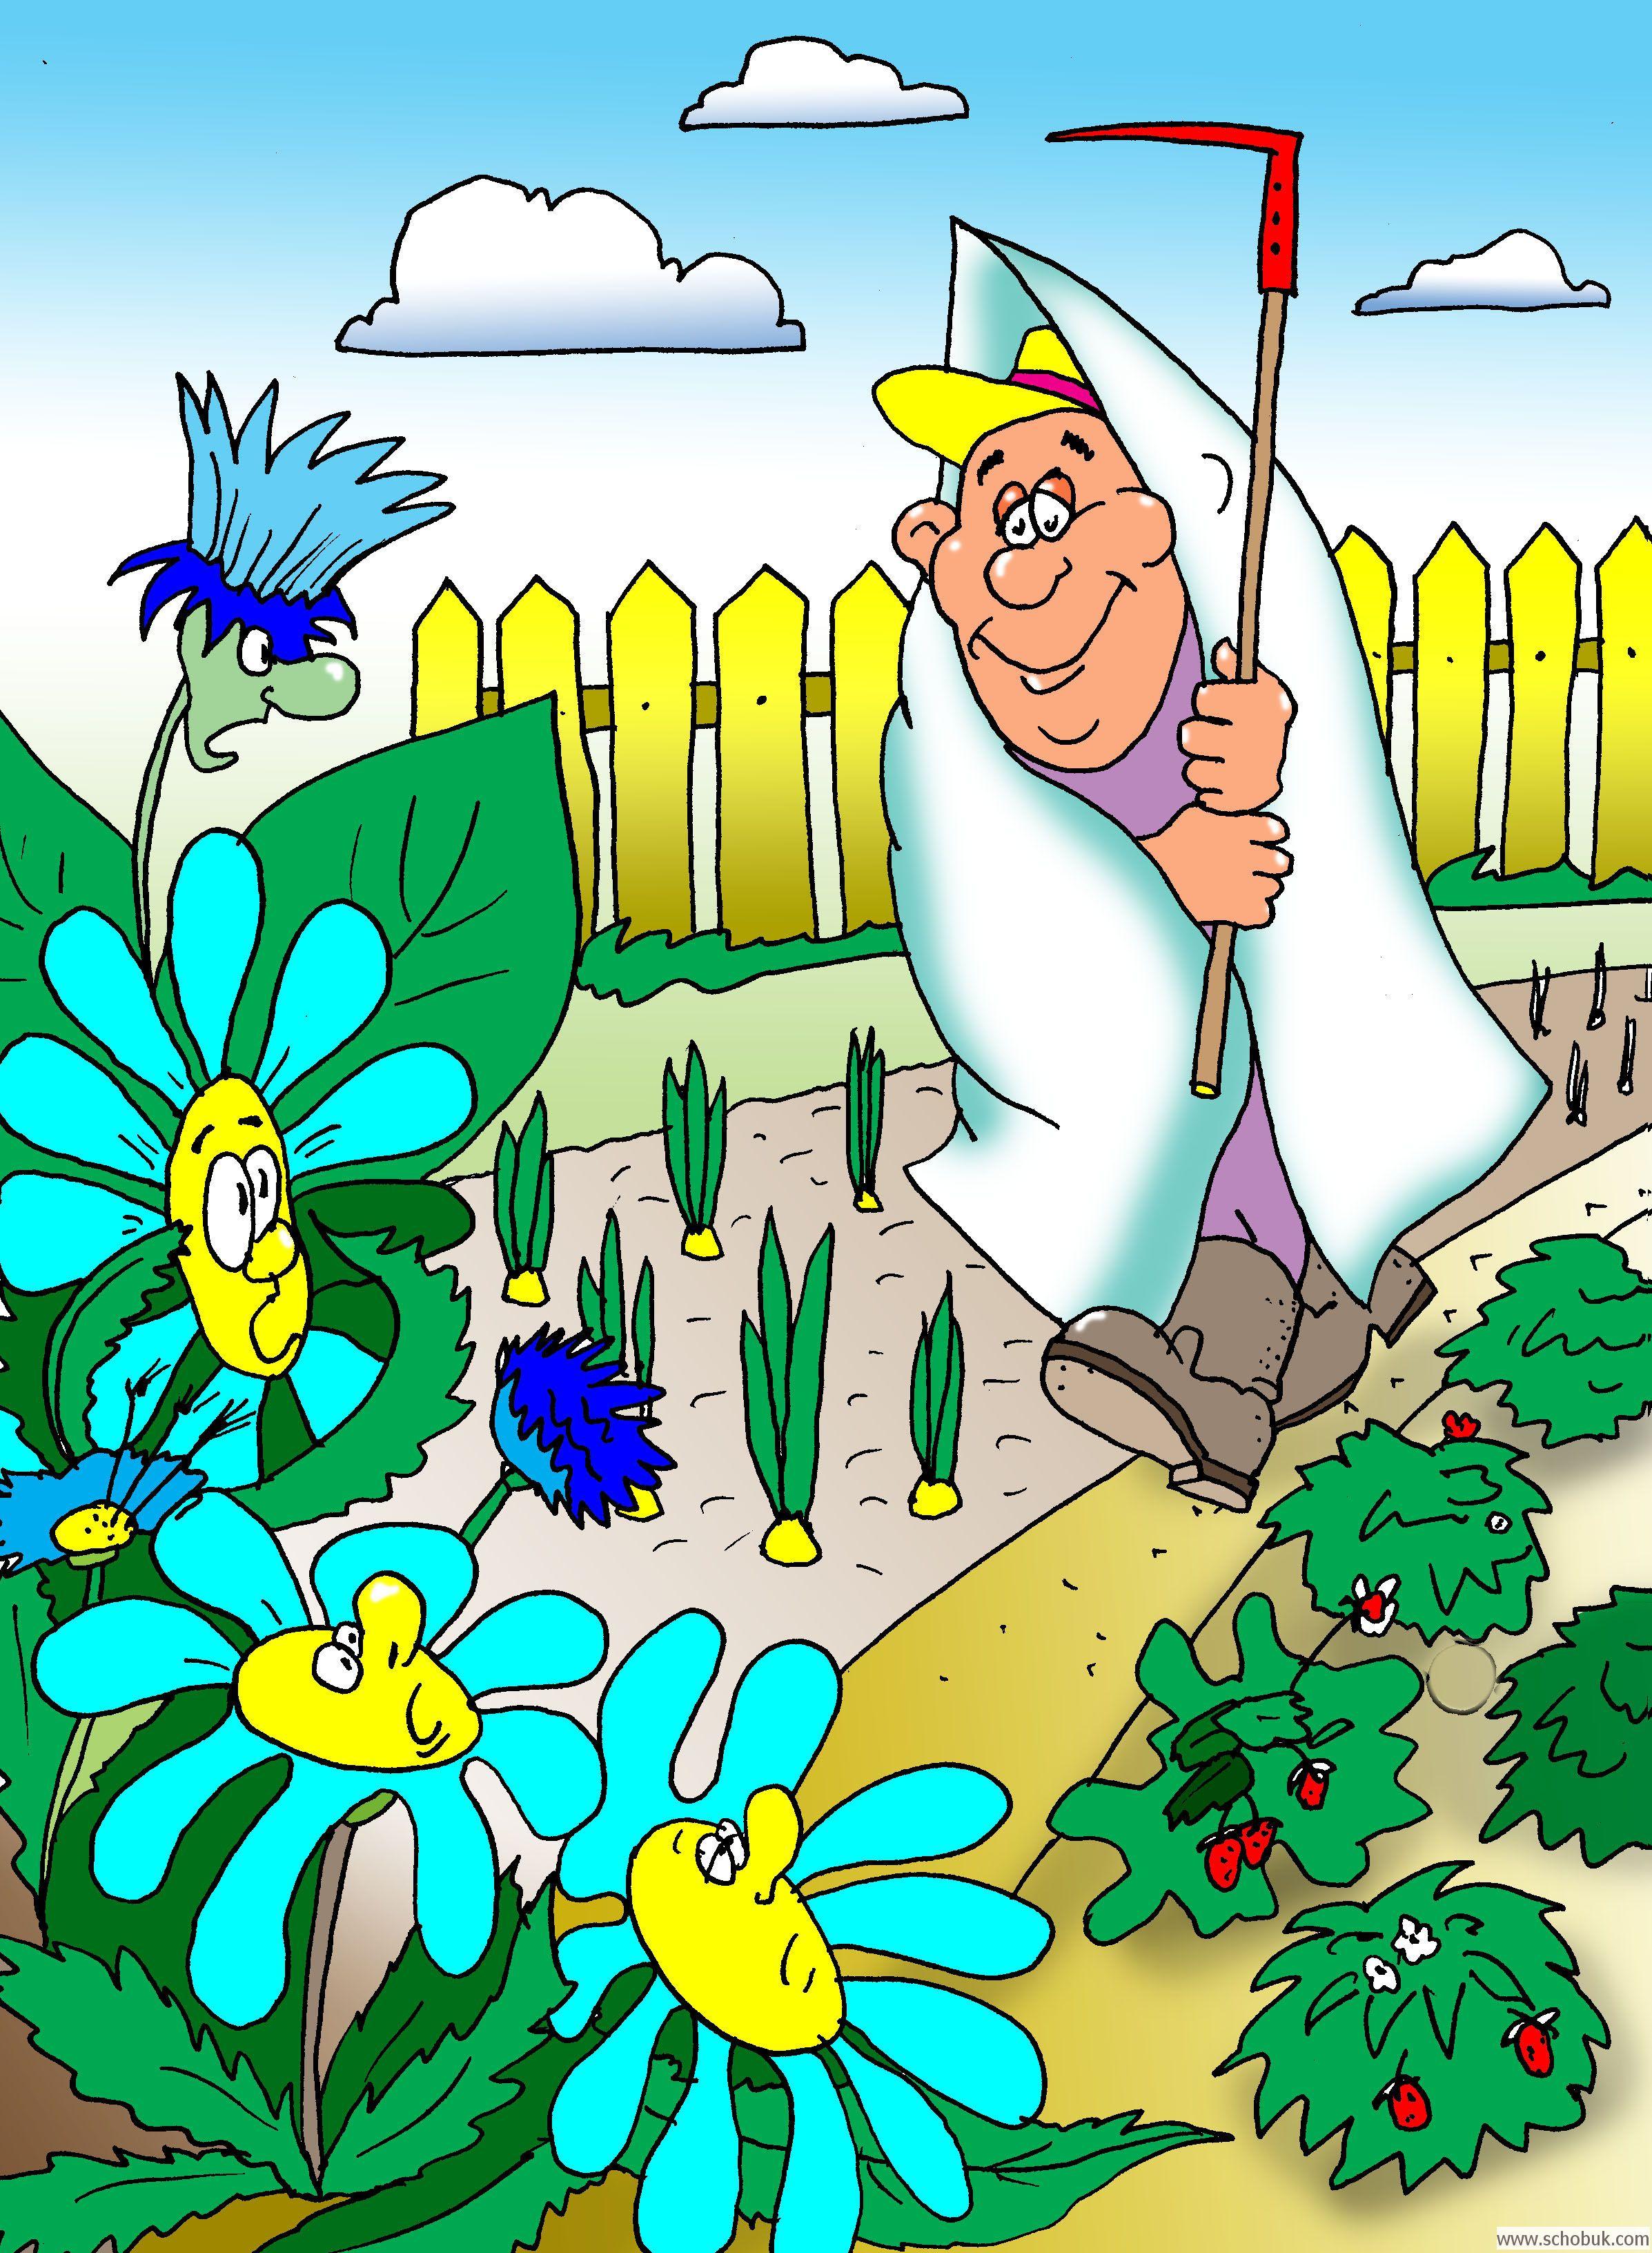 Юбилеем мужчине, приколы про огородников картинки